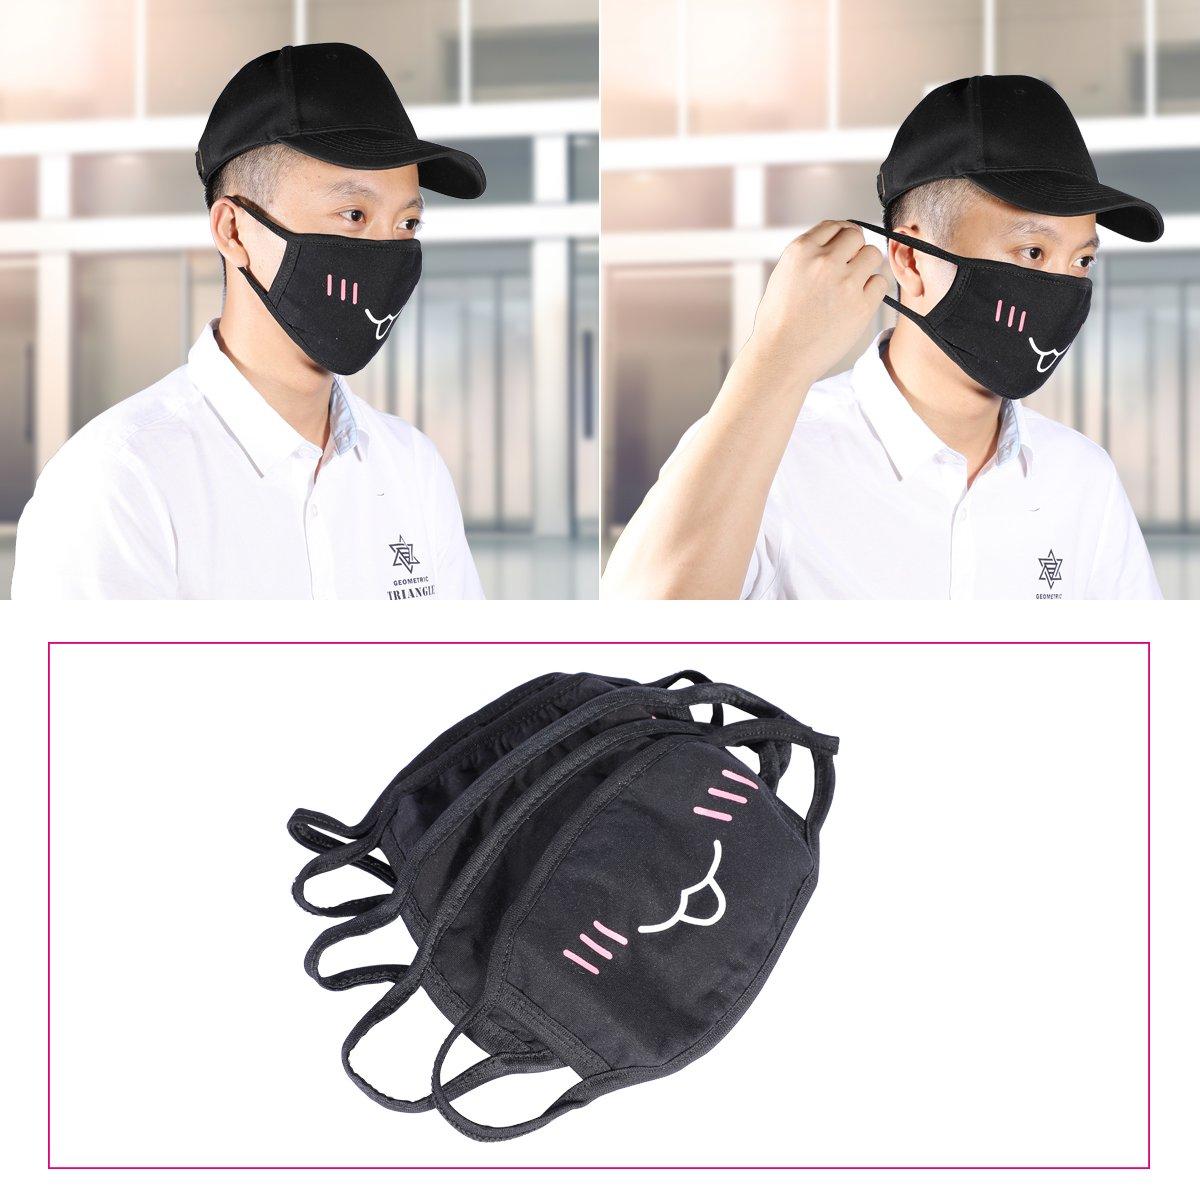 Mouth Masks,MagicFour 5Pack Kawaii Muffle Mask,Black Anti Dust Cute Kaomoji Face Mask Cotton Masks for Boys Girls by MagicFour (Image #6)